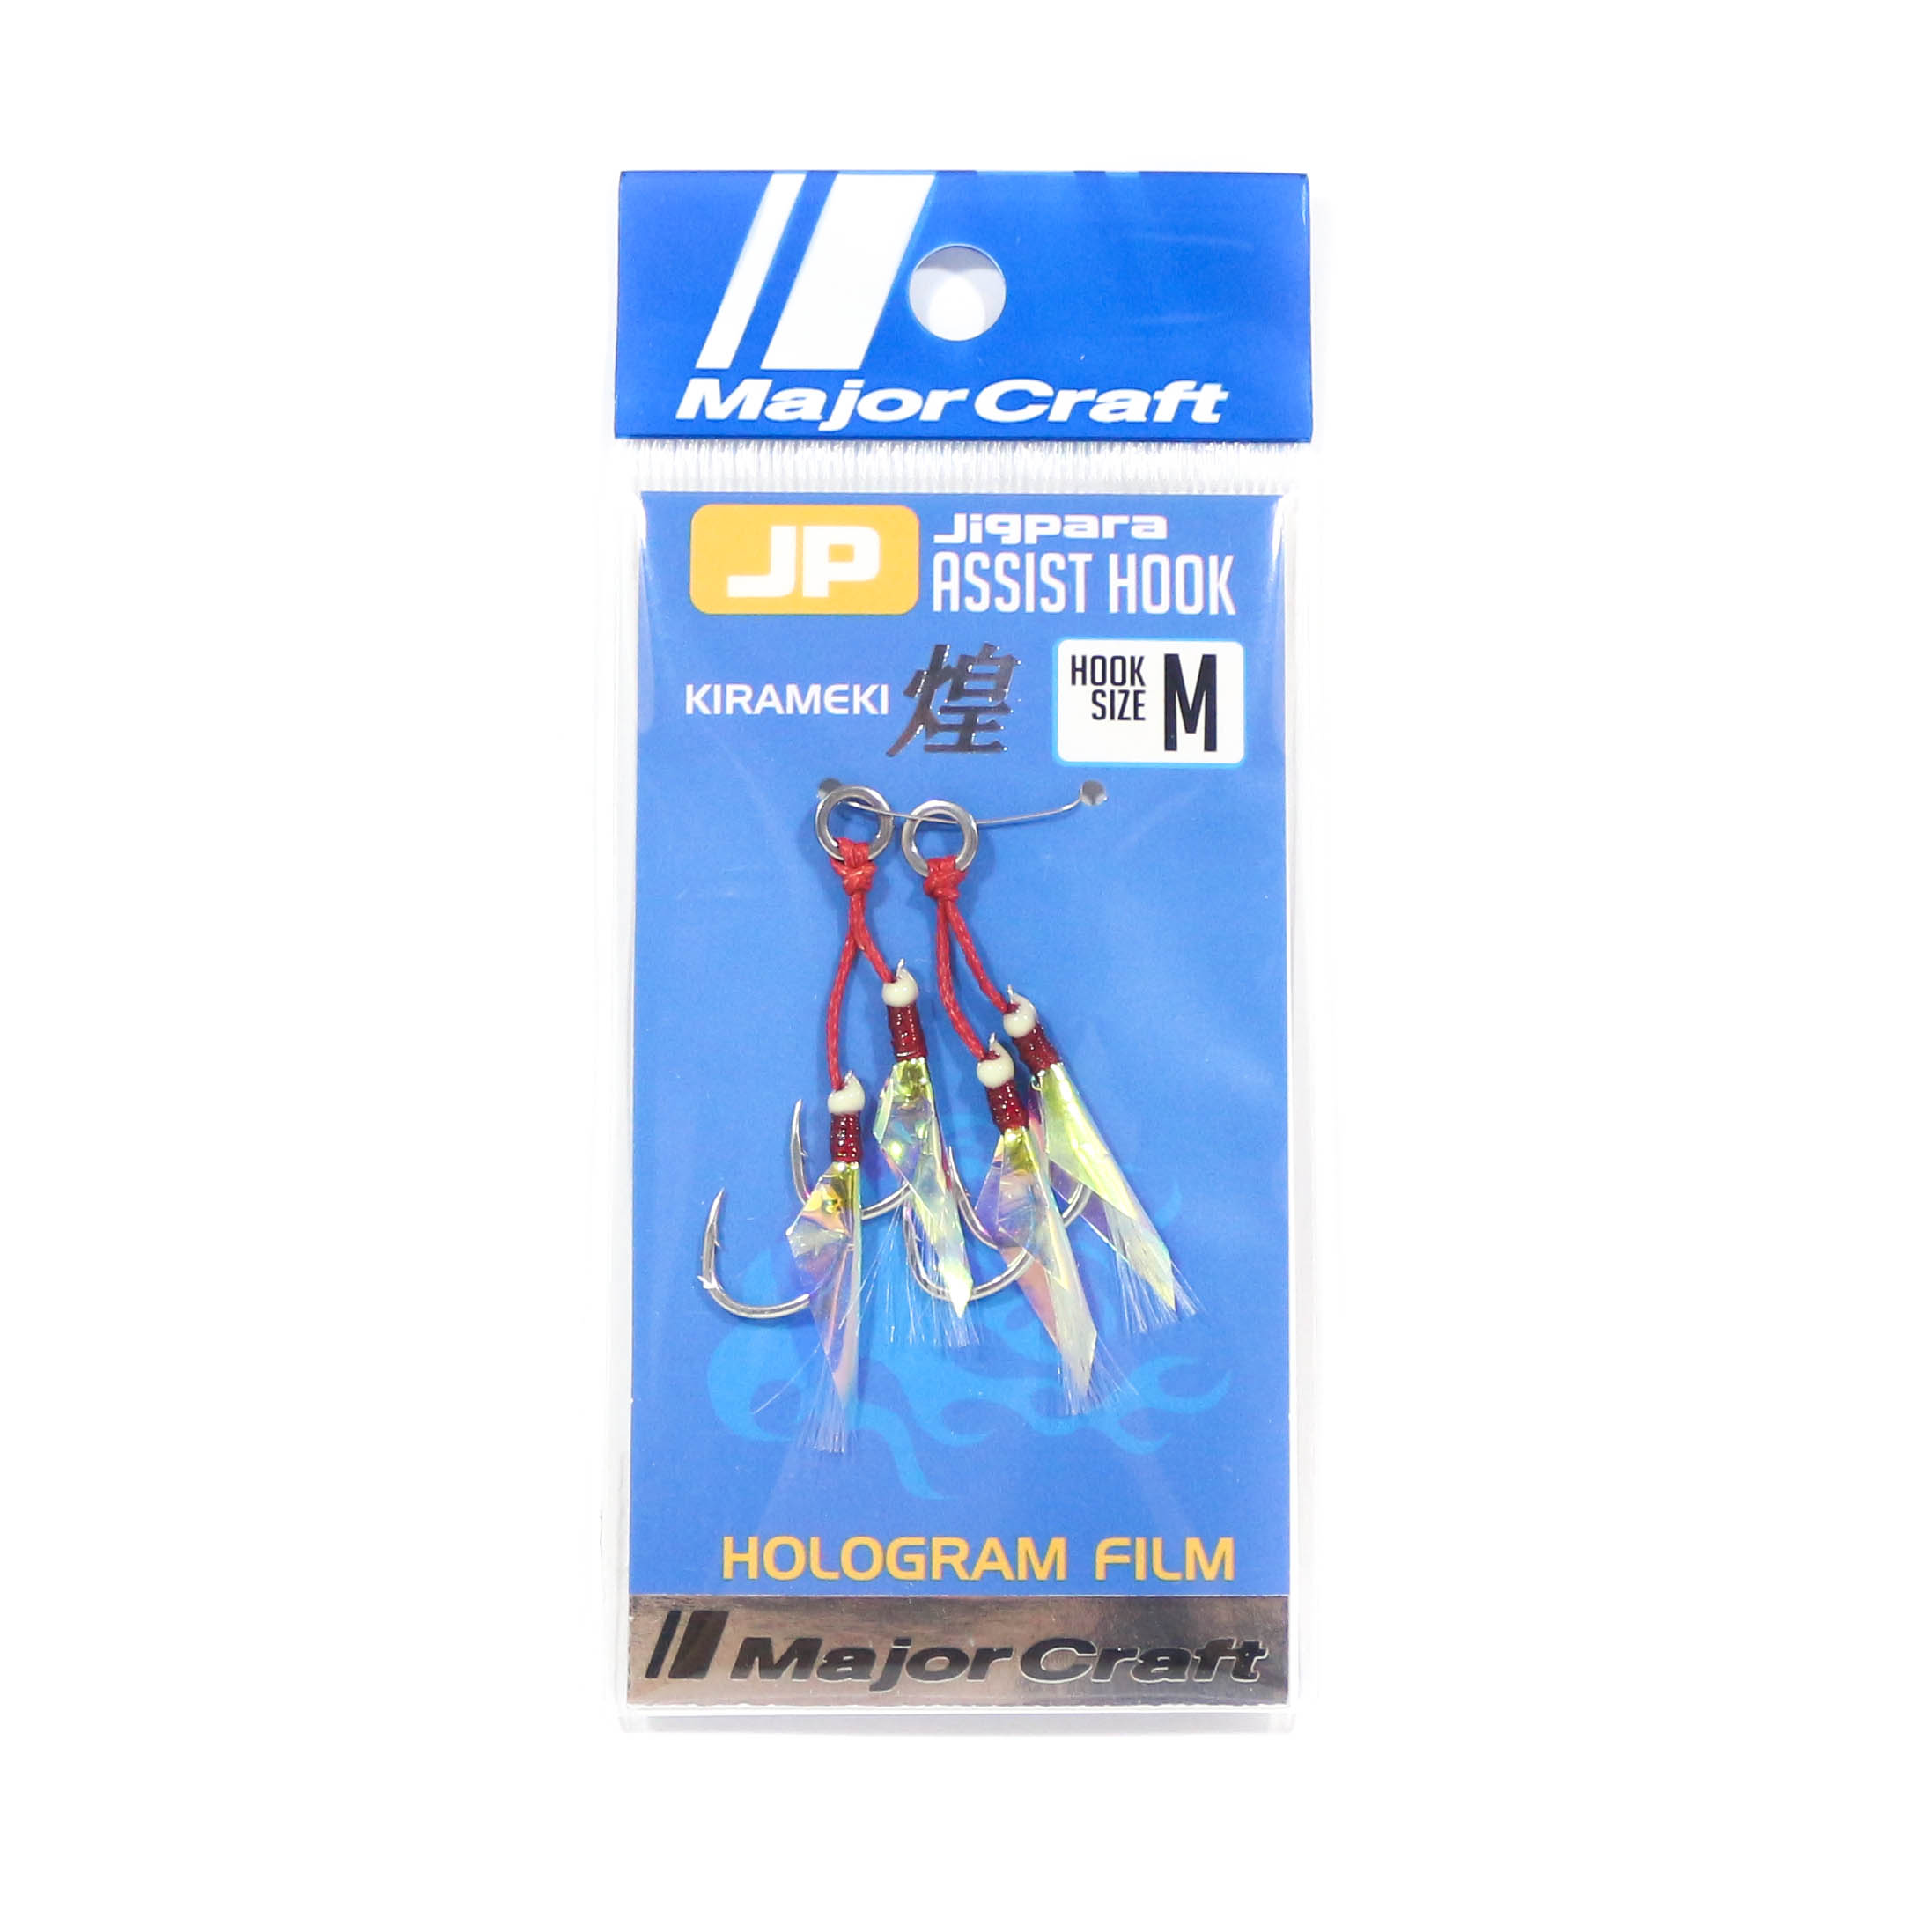 Major Craft JPS-Assist Holo Double Hooks Size M (Size 1) 2 pc per pack (4517)